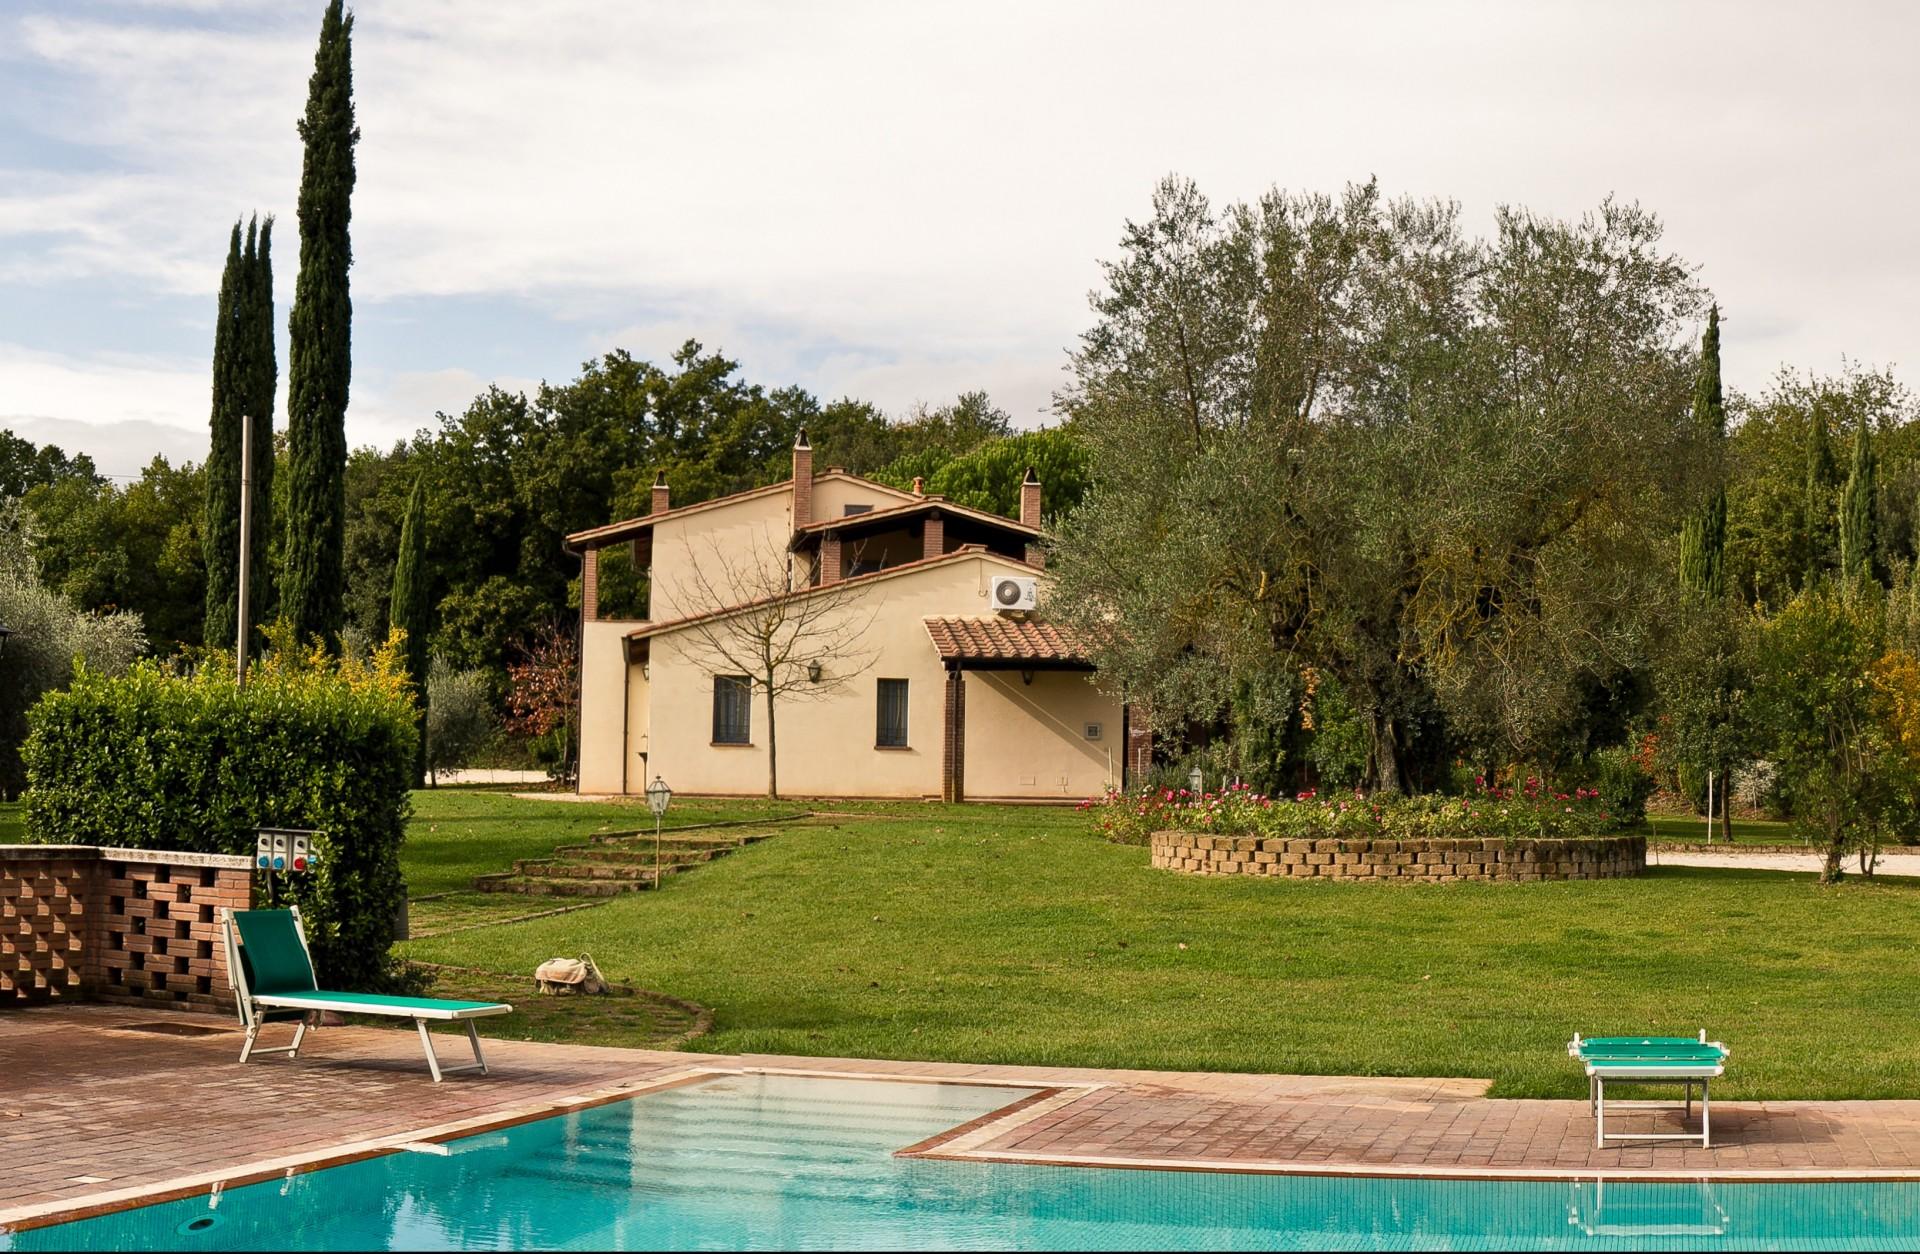 Castello Delle Regine - Podernovo Houses & Country